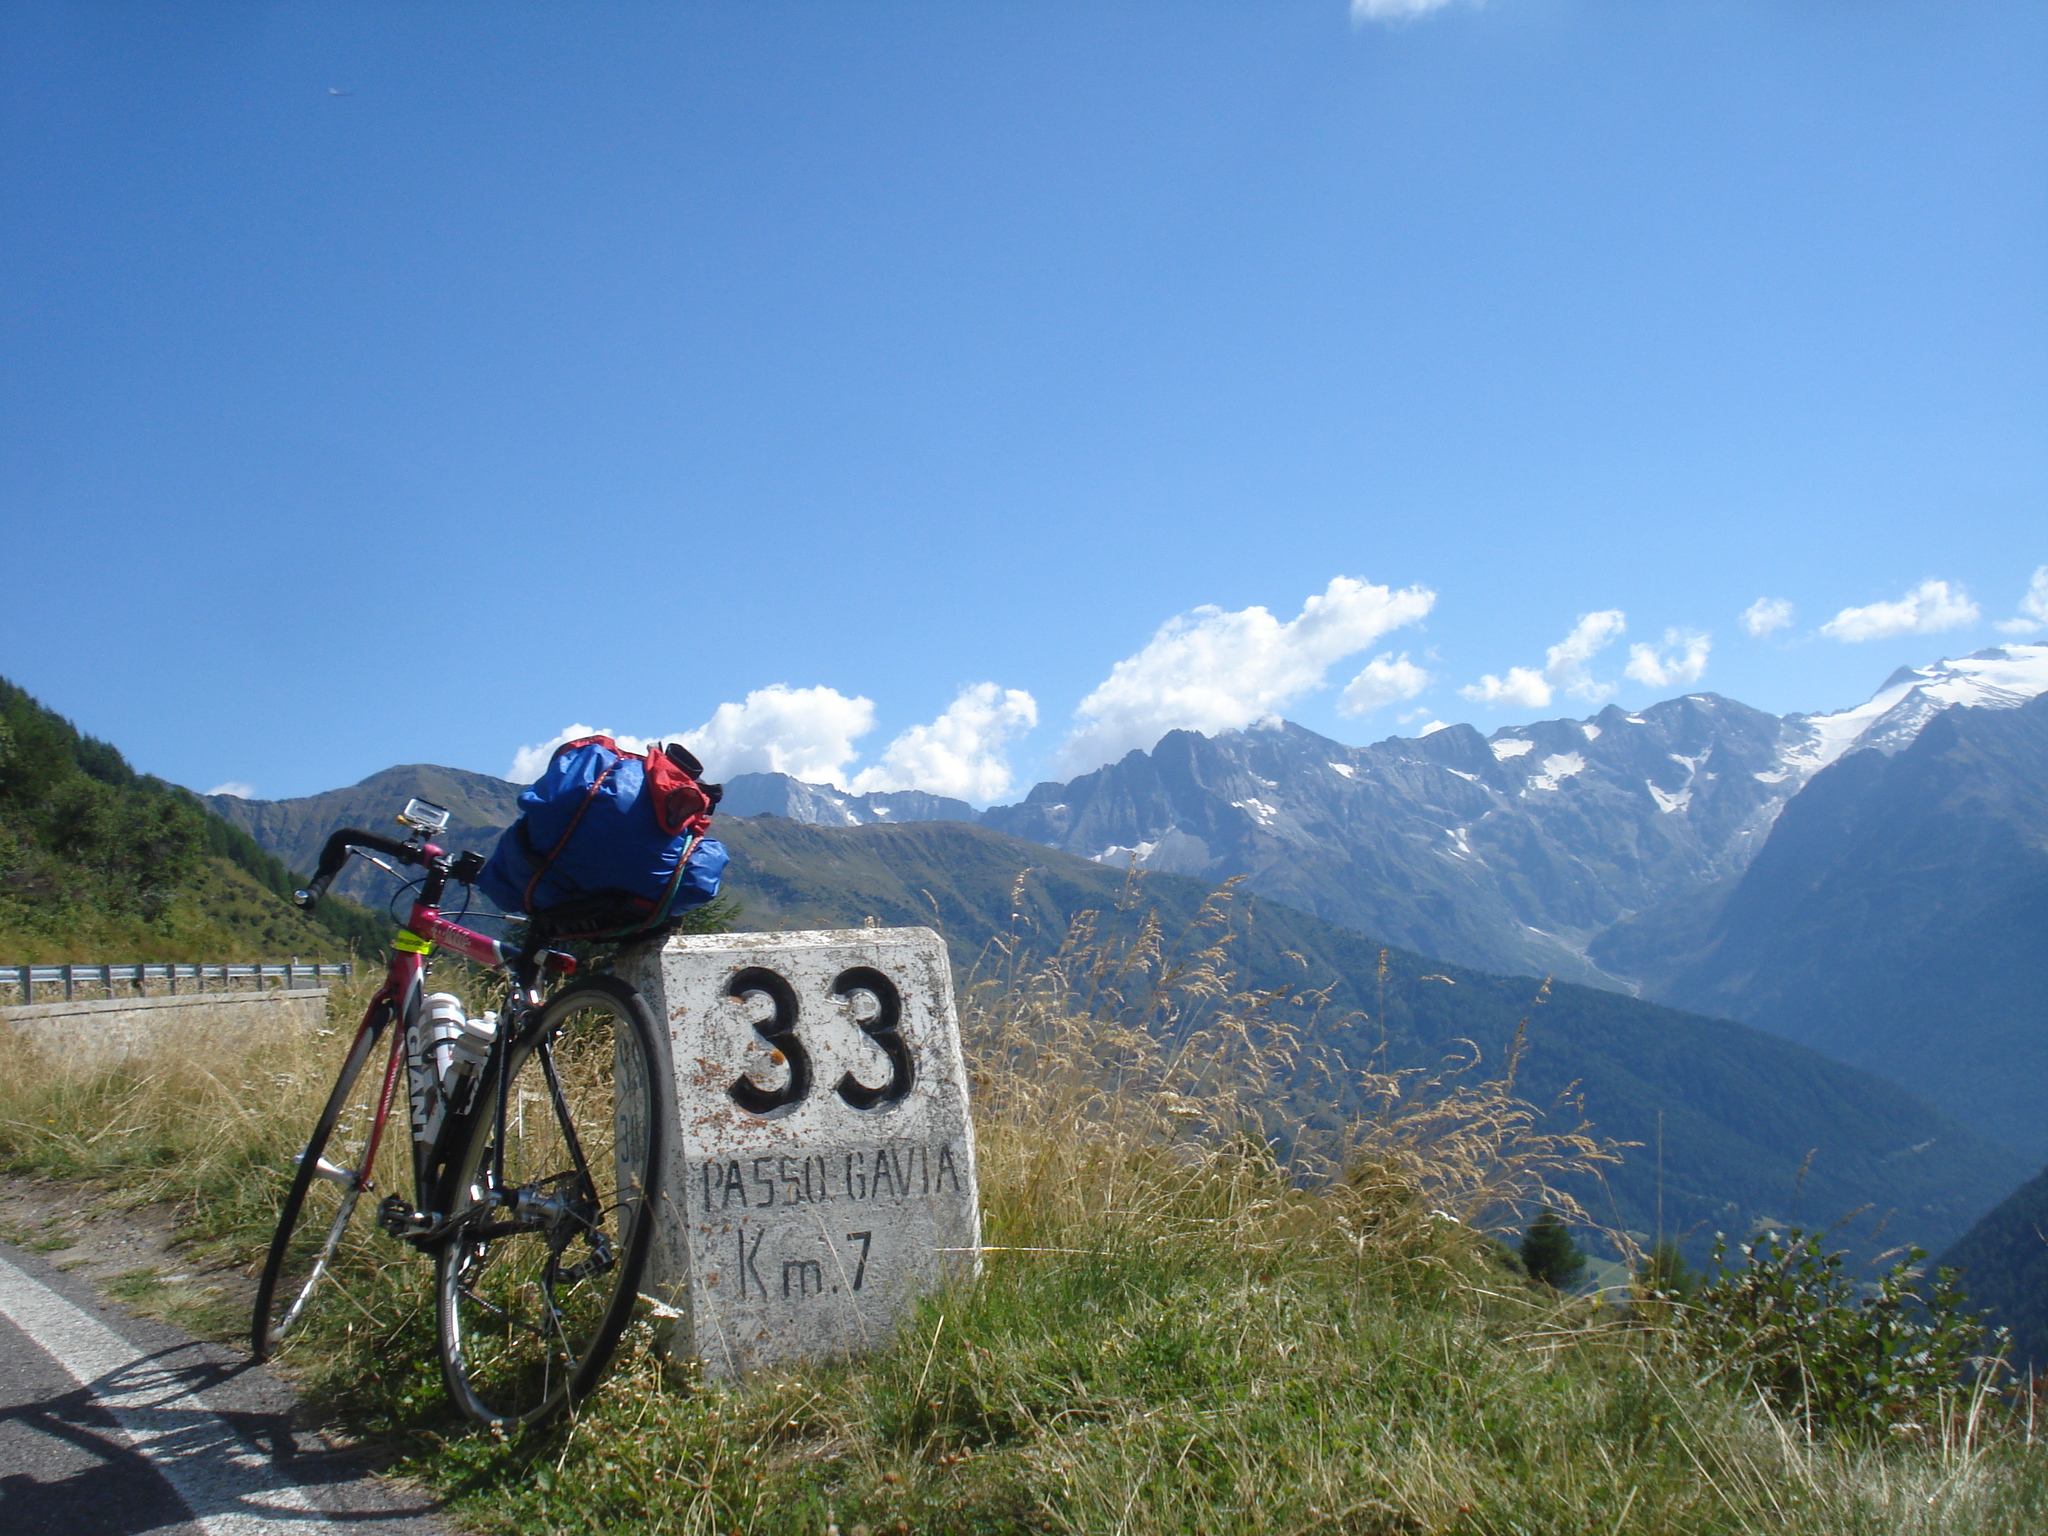 3 Tag Dimaro Passo Tonnale Gavia Pass Bormio Bikemap Your bike